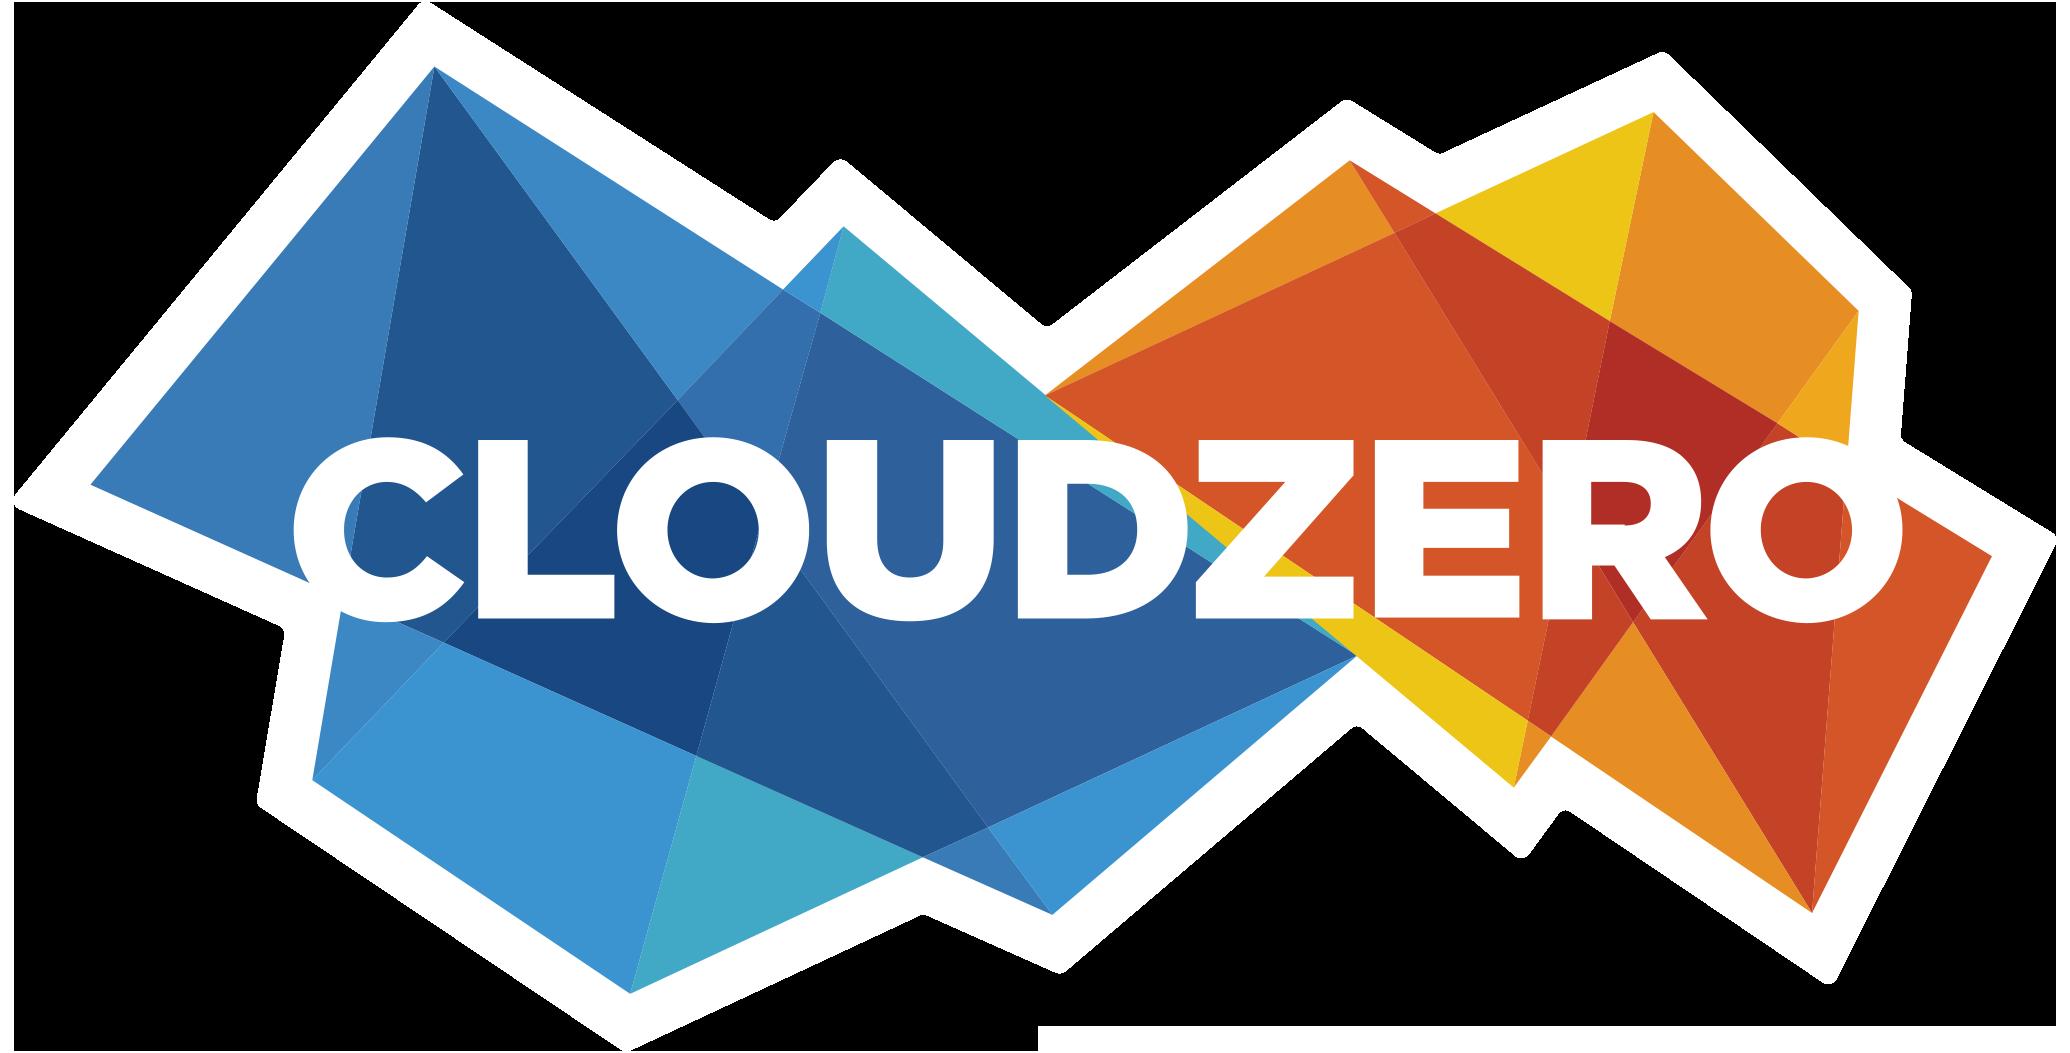 cloudZero-logo-4C-withStroke-png